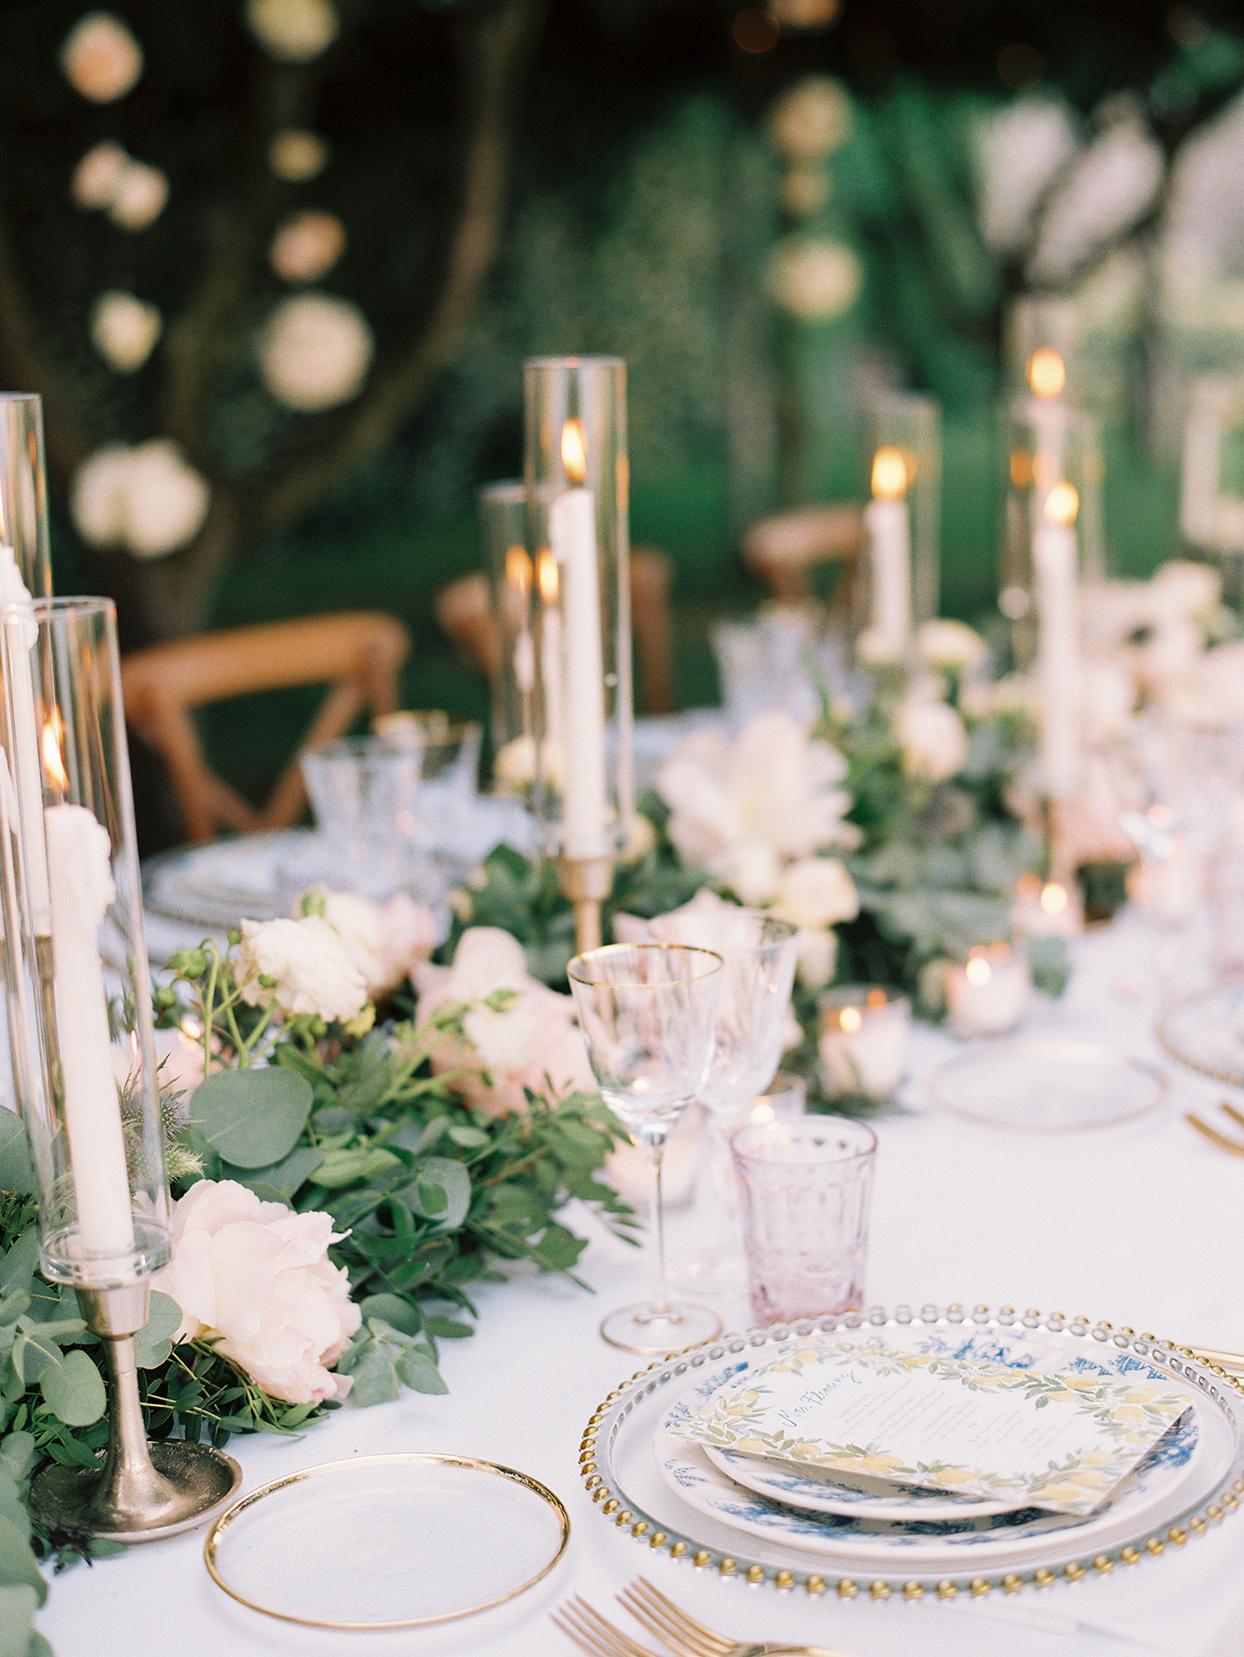 jacqueline david wedding reception table setting pastels